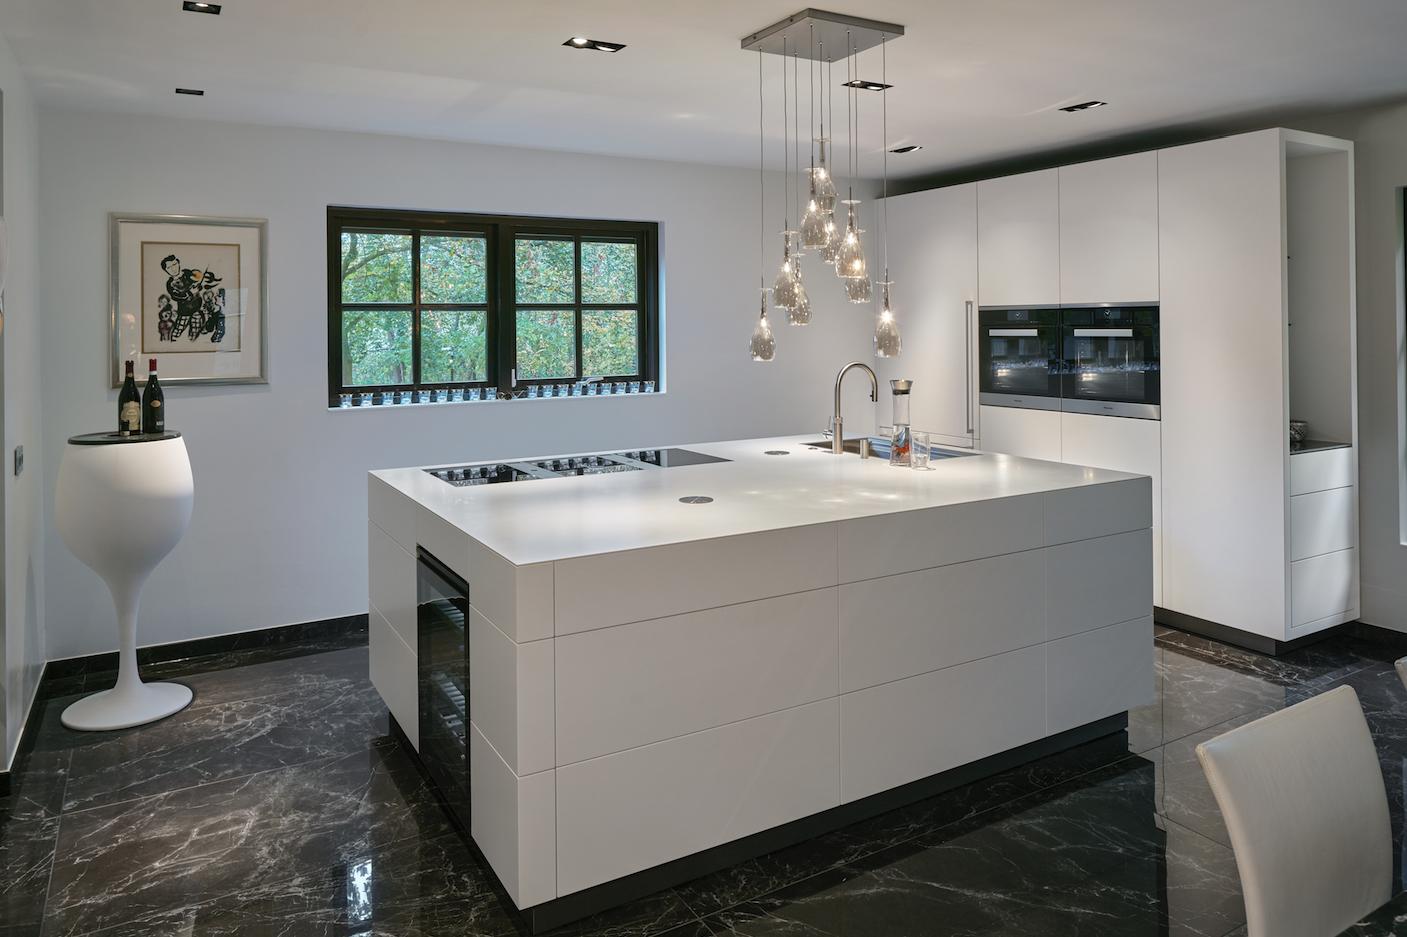 Strakke Design Keukens : In deze strakke design keuken komt het witte eiland goed tot zn